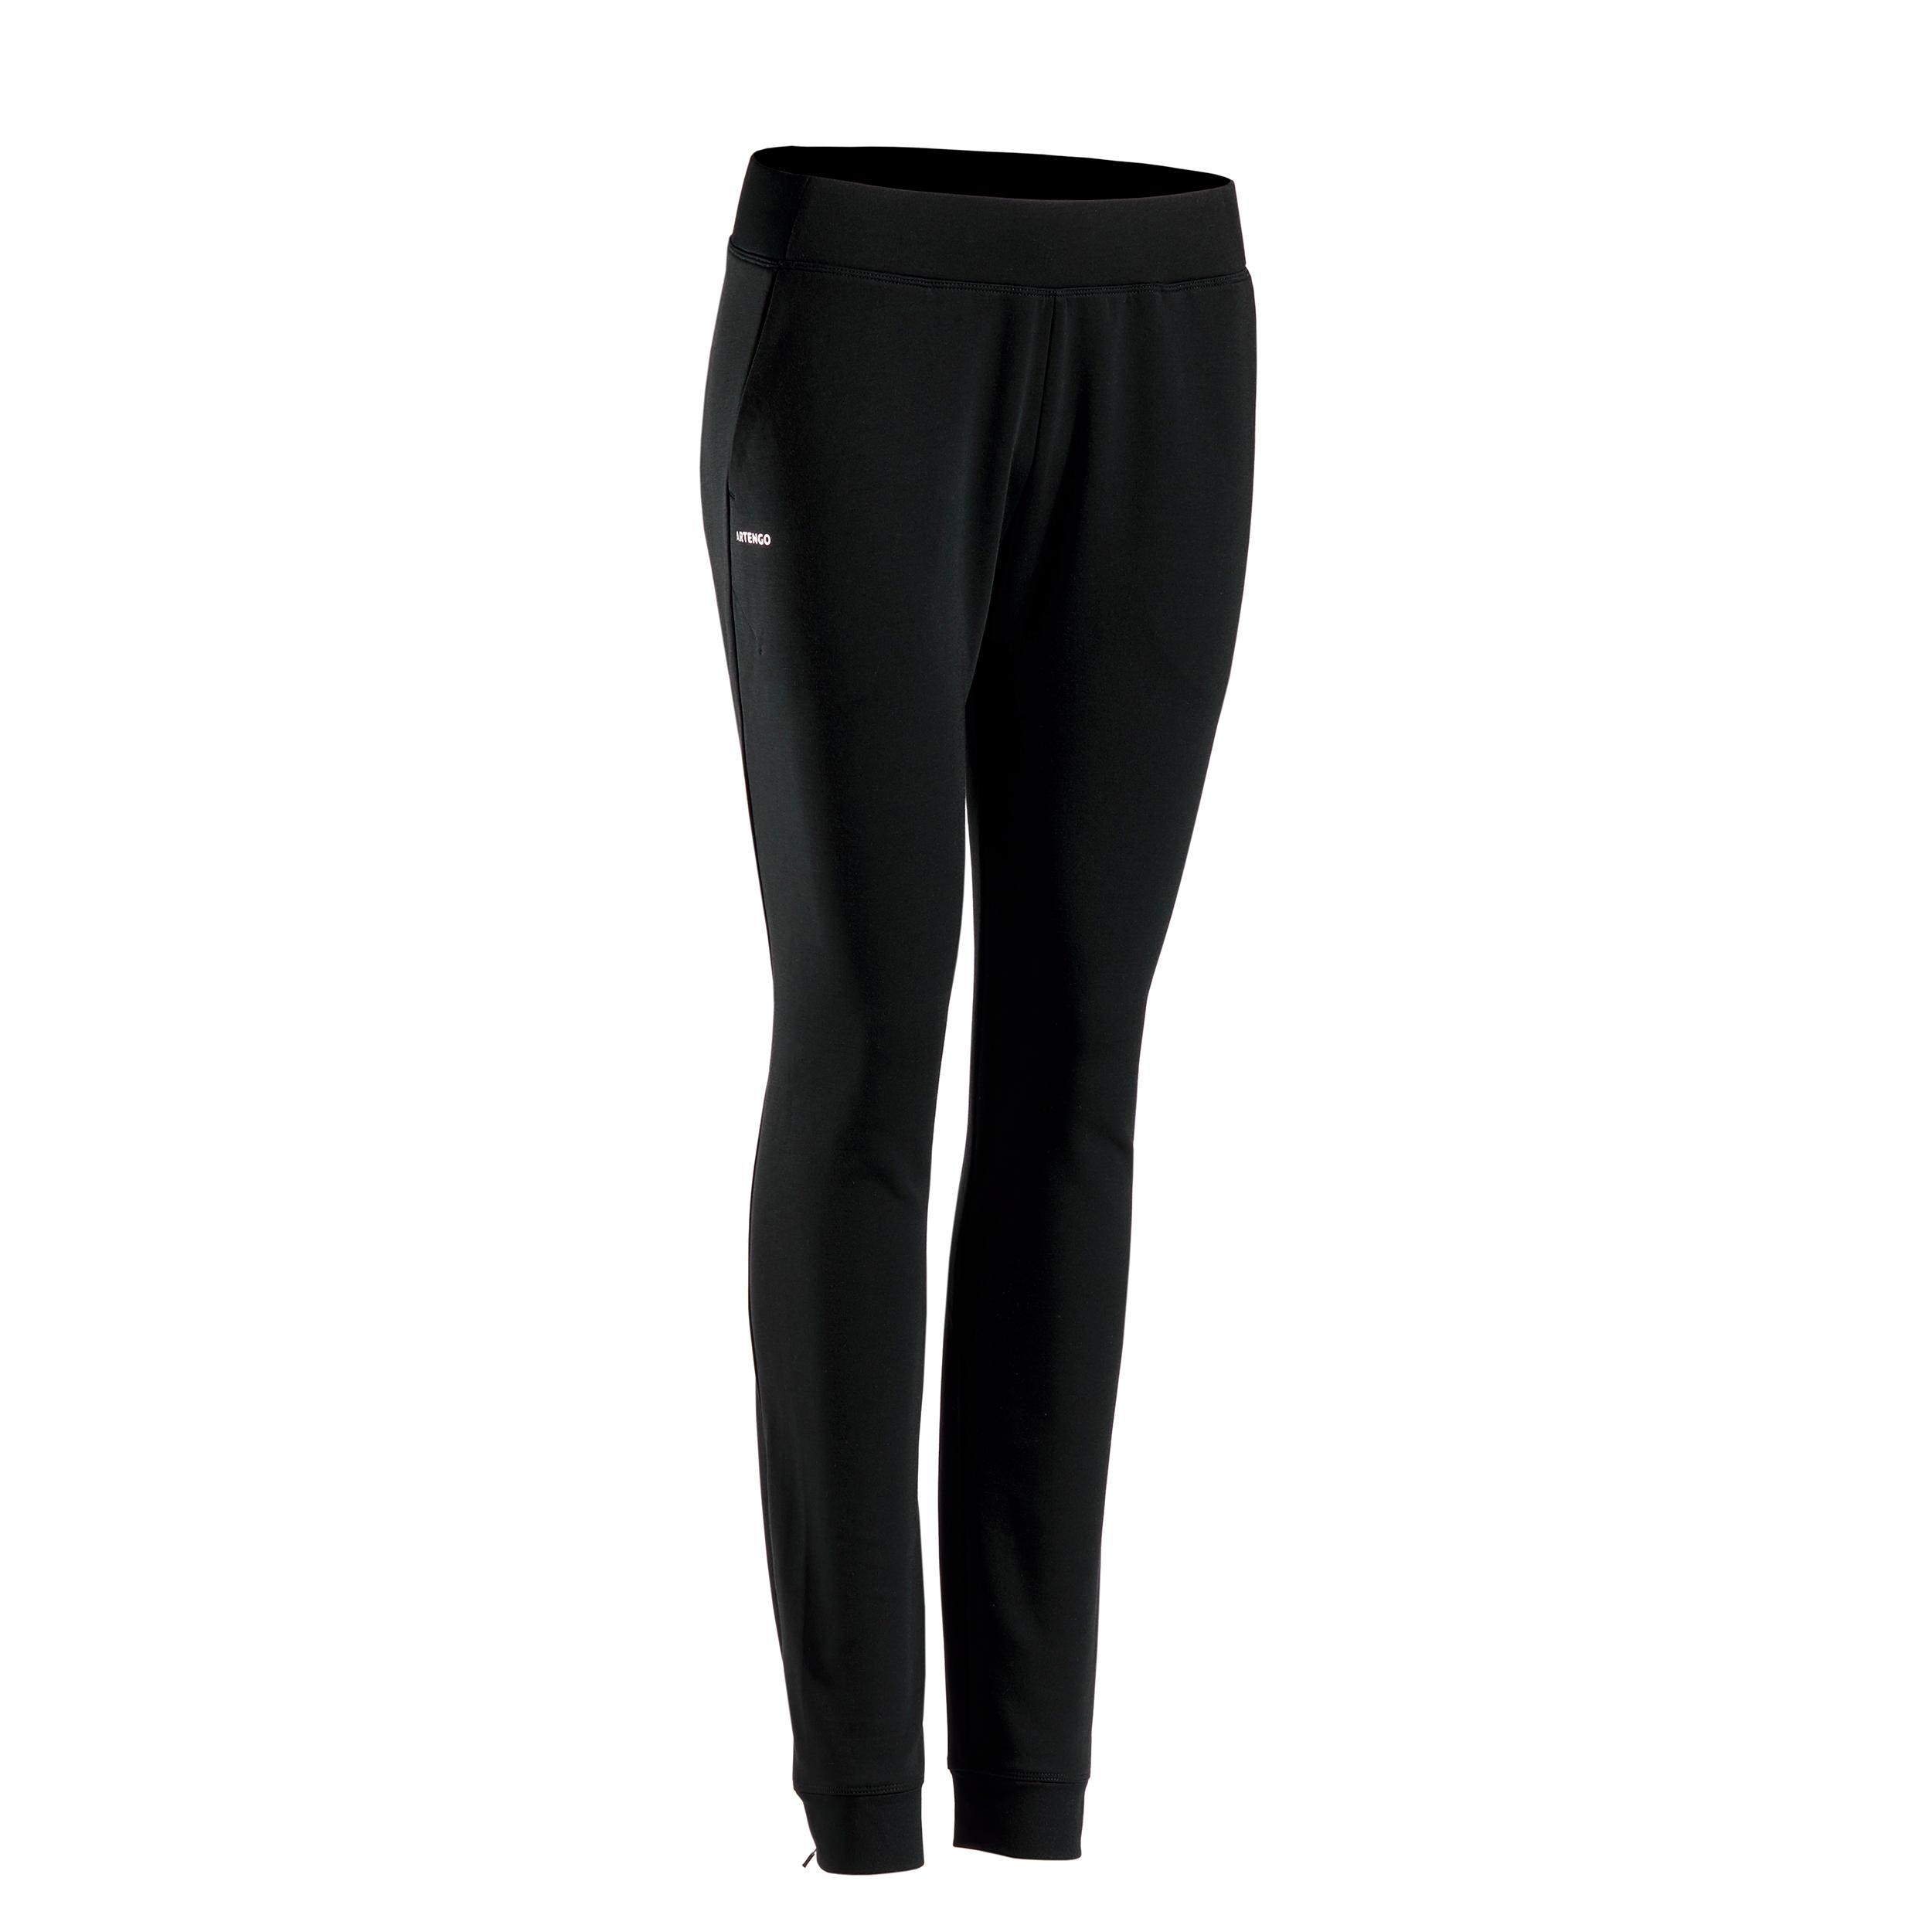 Tennishose Trainingshose PA Dry 900 Damen | Sportbekleidung > Sporthosen > Tennisshorts | Artengo